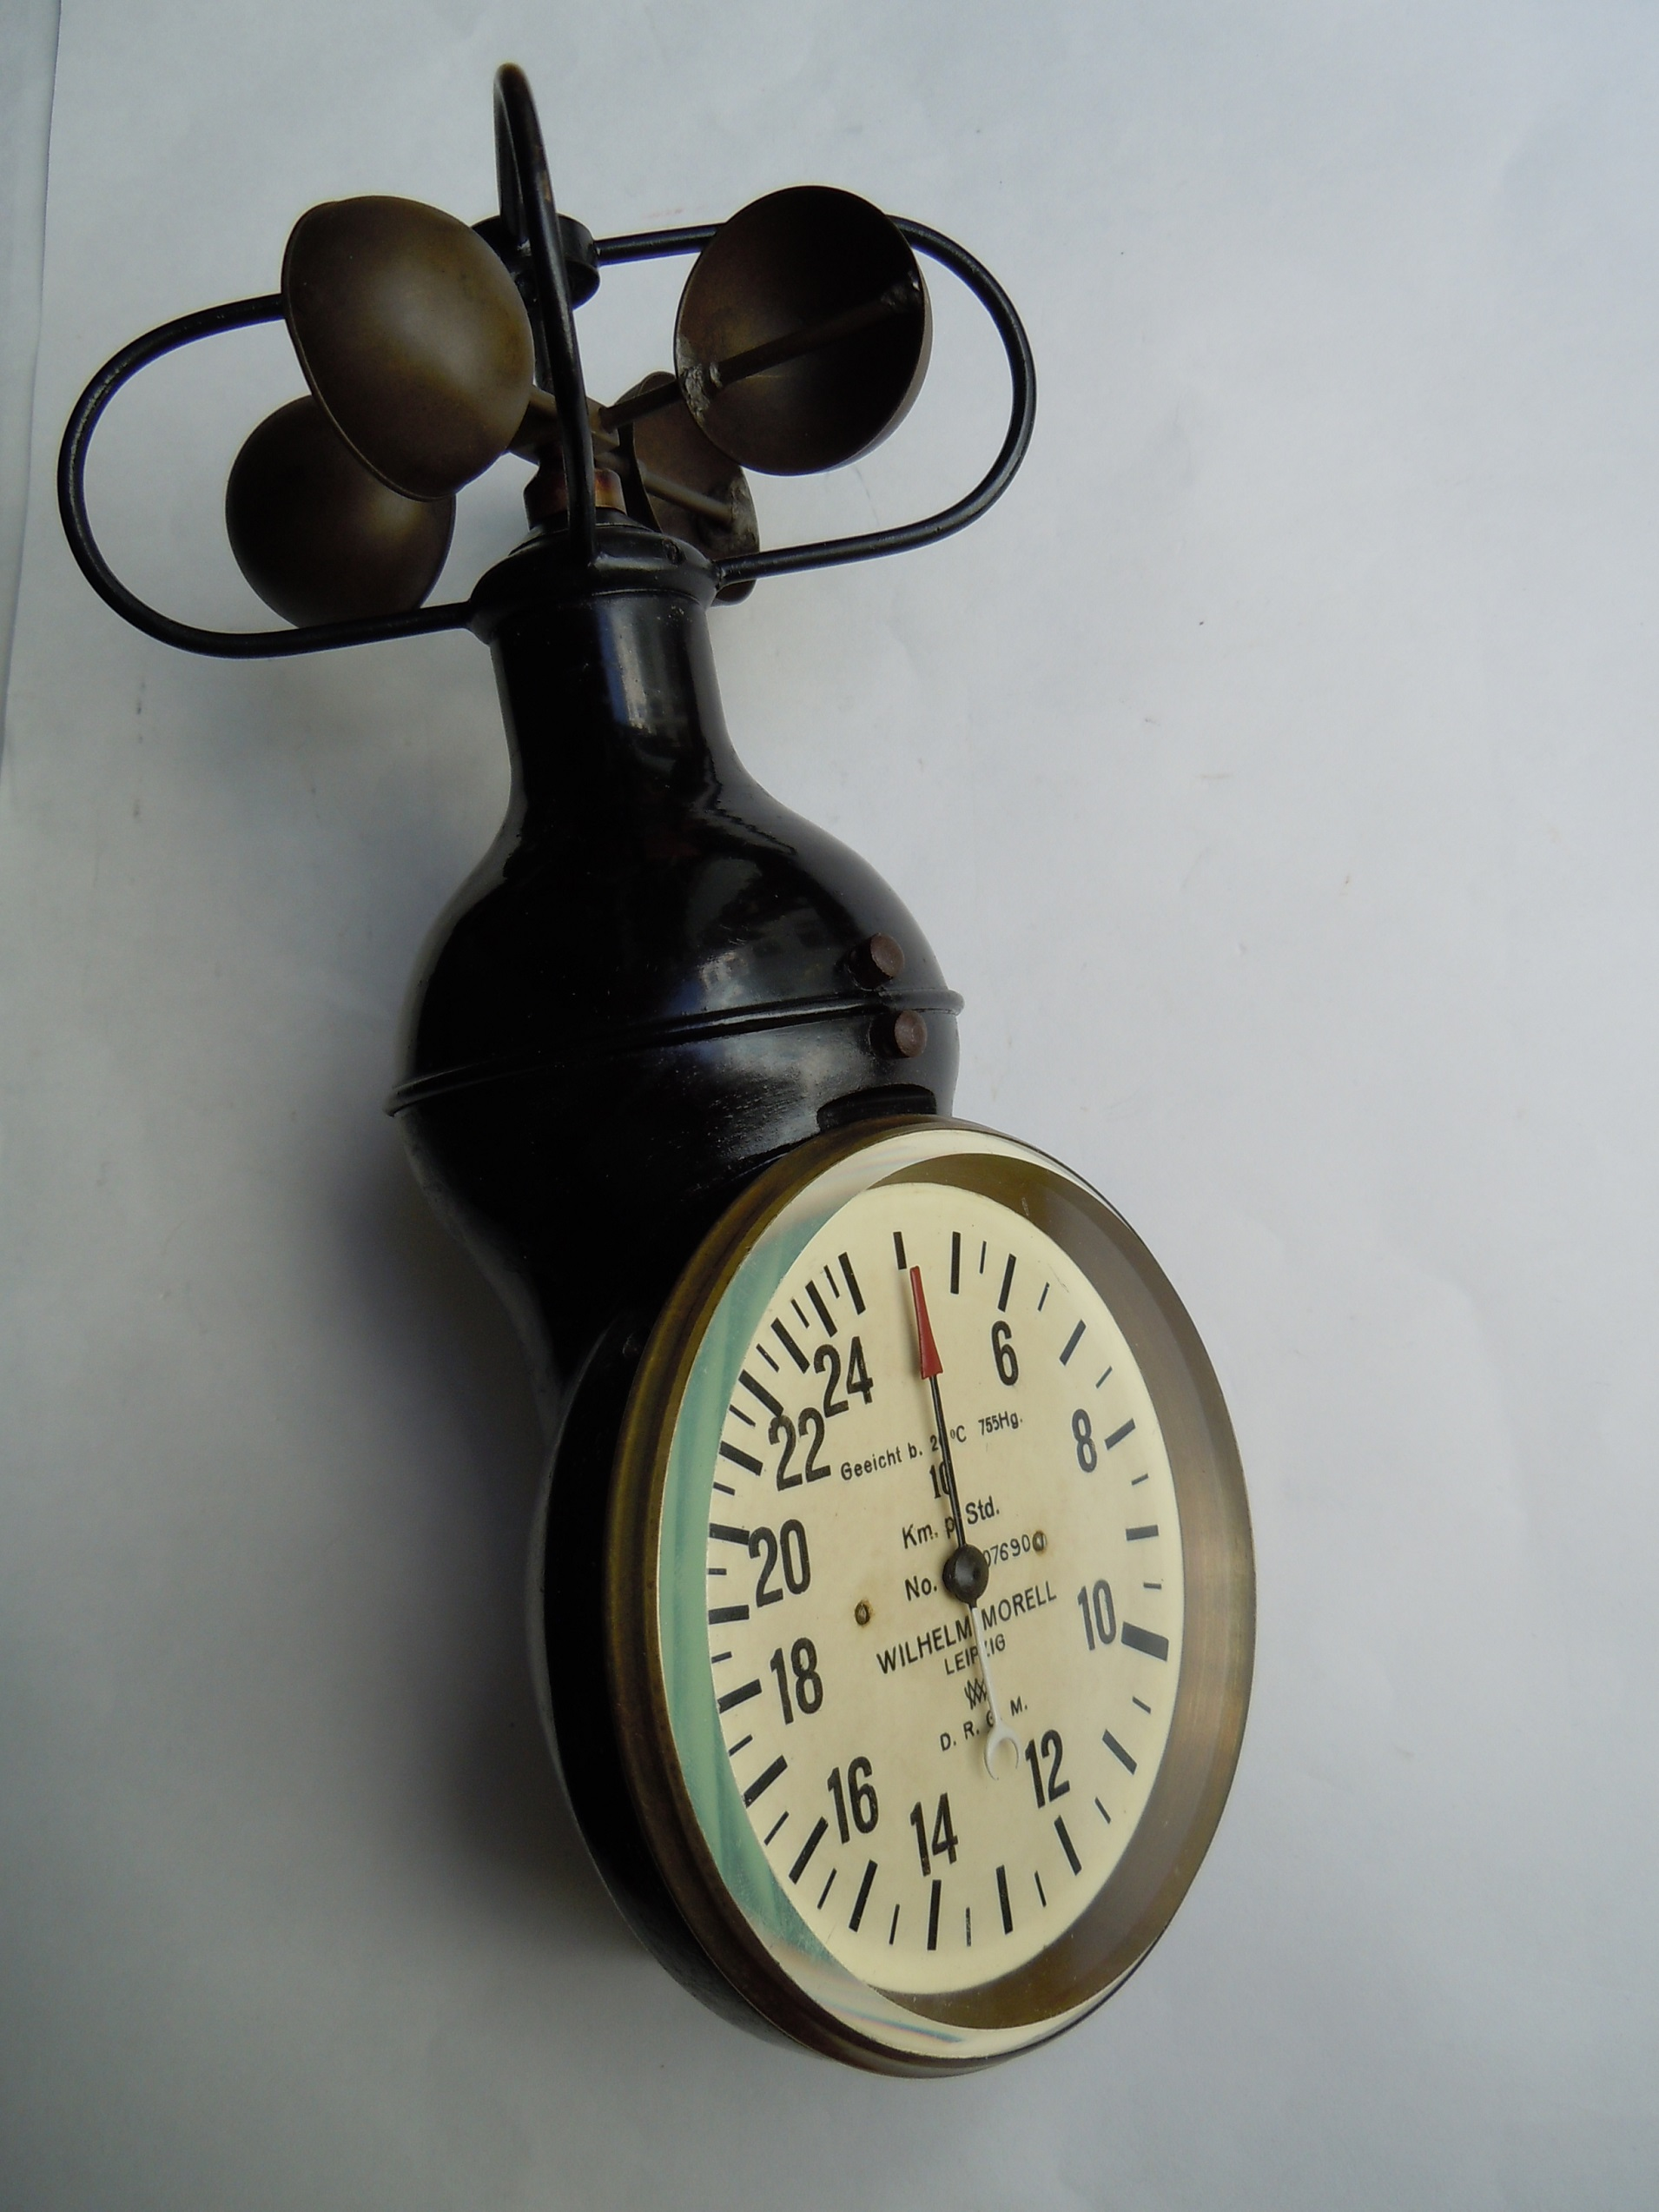 schalenkreuz anemometer morell 250 km h 1918 deutscheluftwaffe. Black Bedroom Furniture Sets. Home Design Ideas